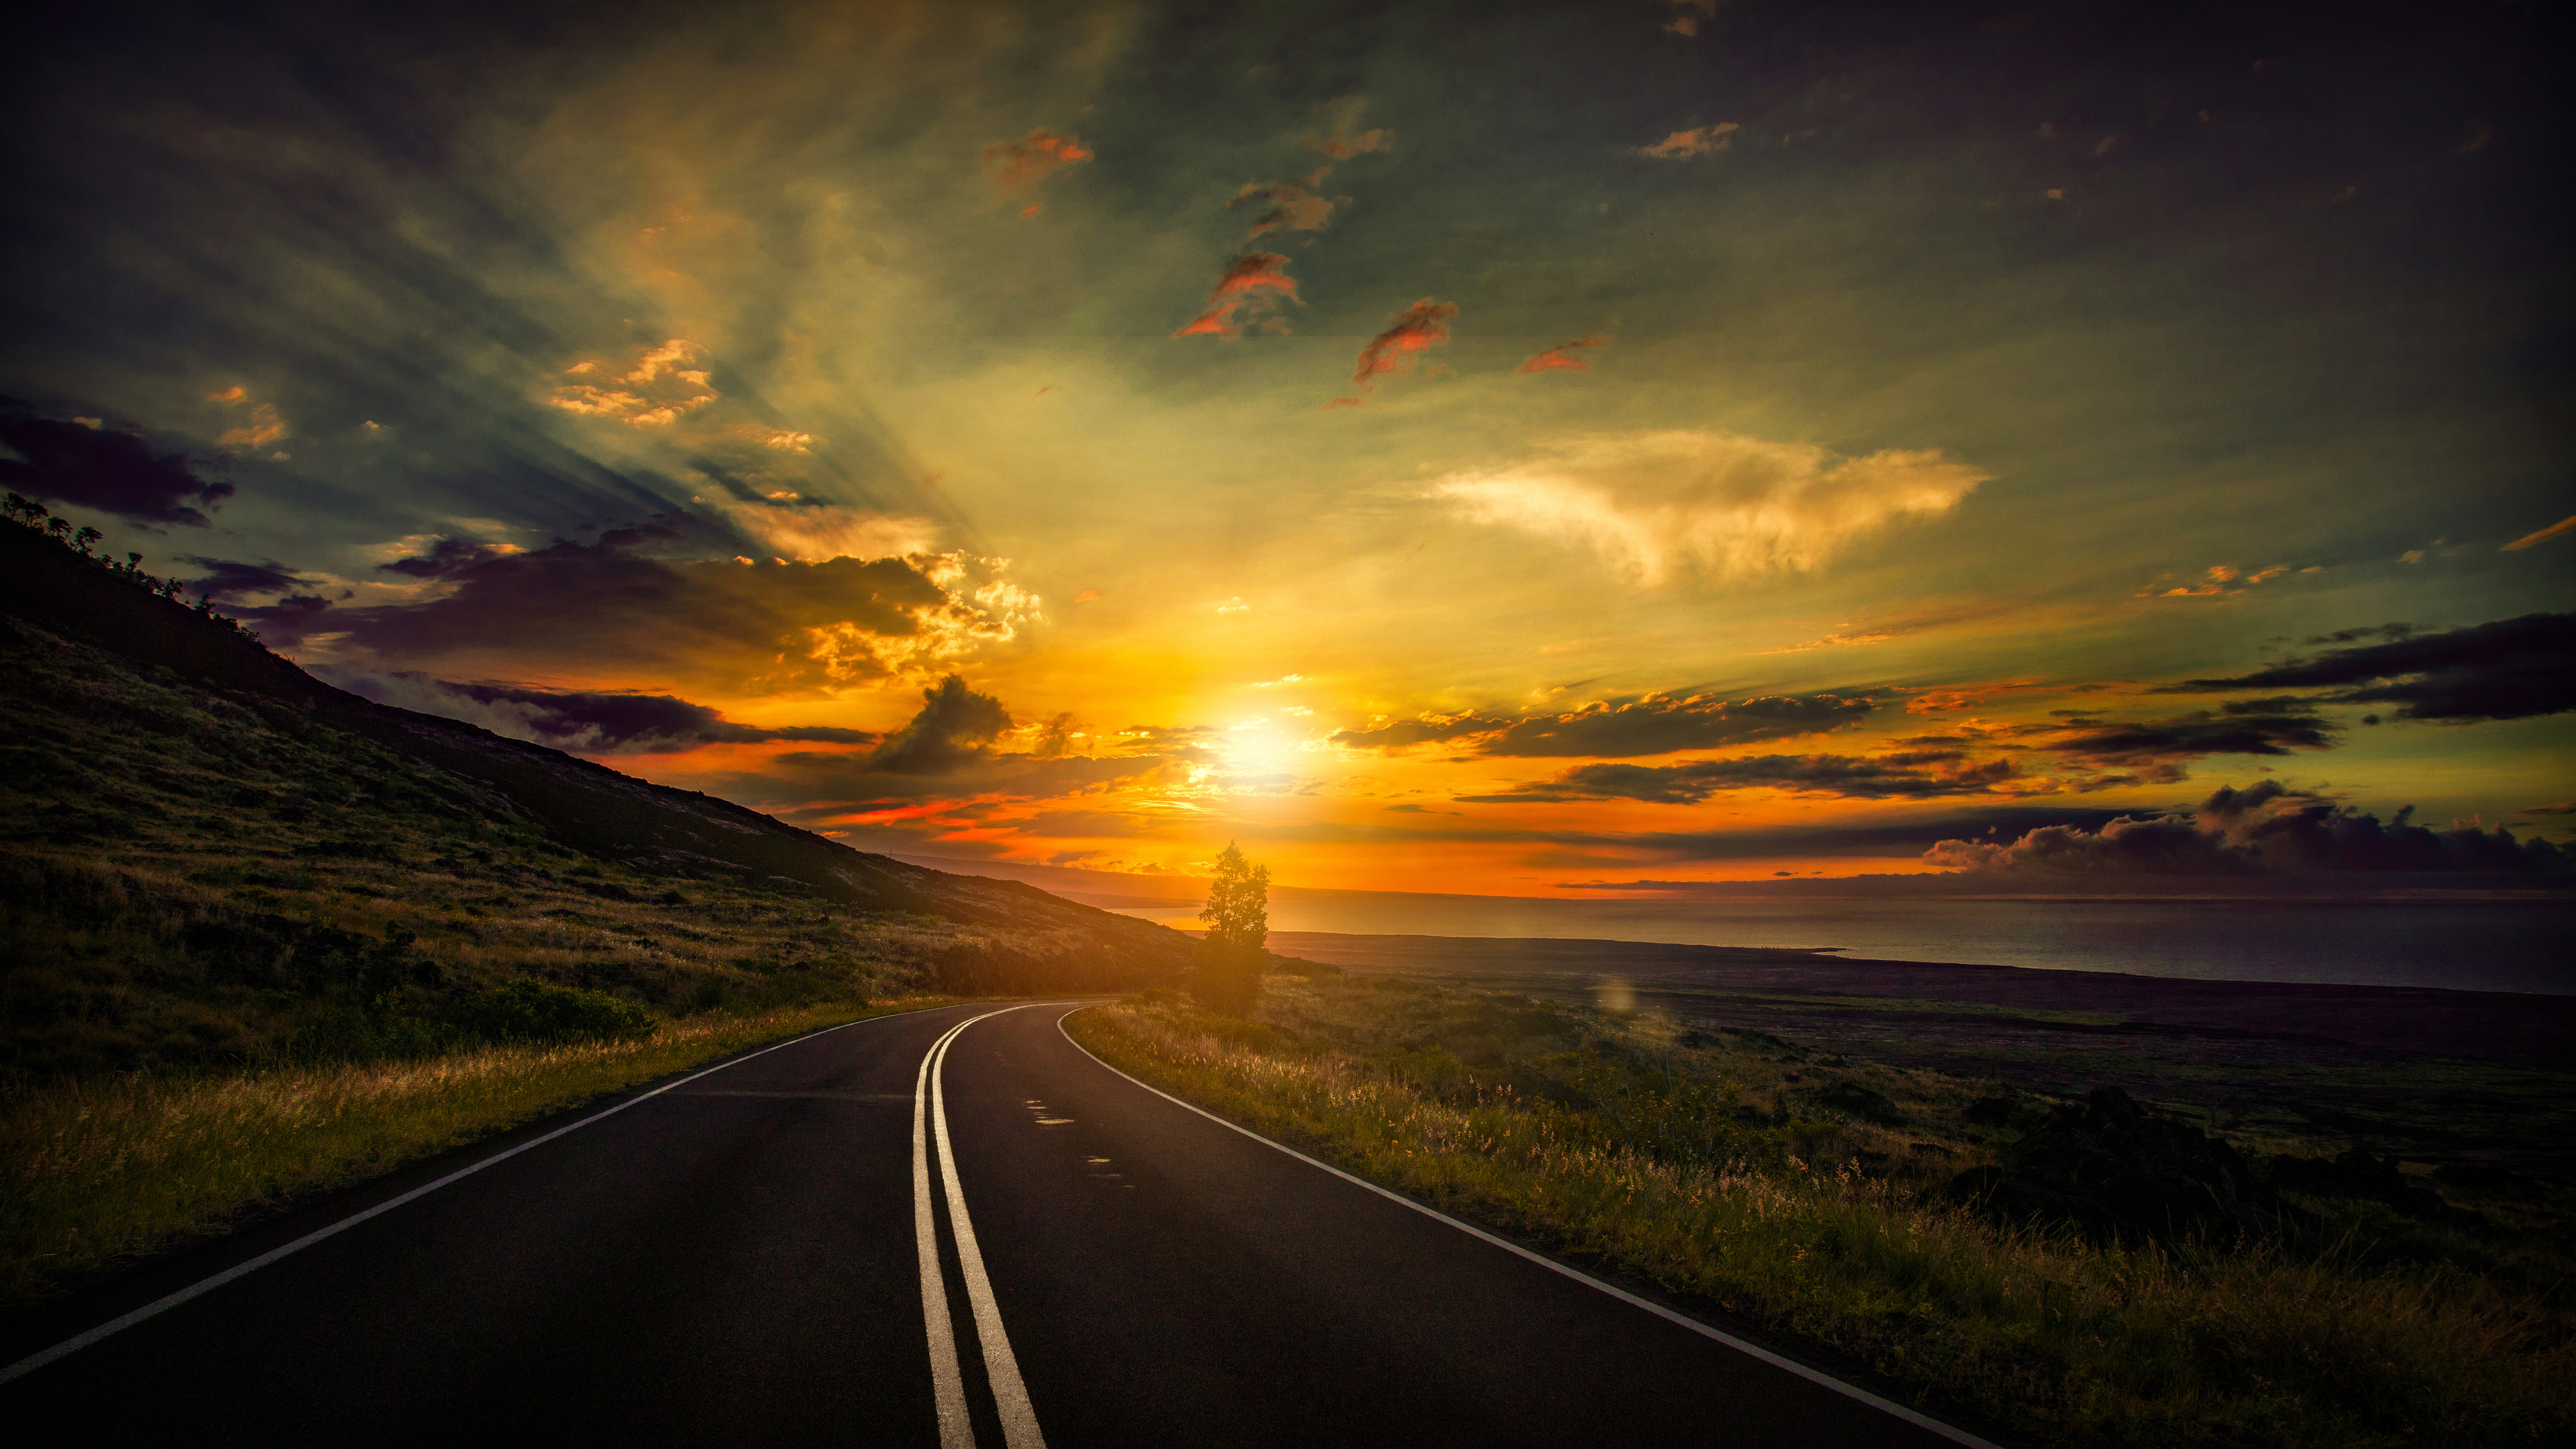 cool sunset road view 4k 1540136353 - Cool Sunset Road View 4k - sunset wallpapers, road wallpapers, nature wallpapers, hd-wallpapers, 8k wallpapers, 5k wallpapers, 4k-wallpapers